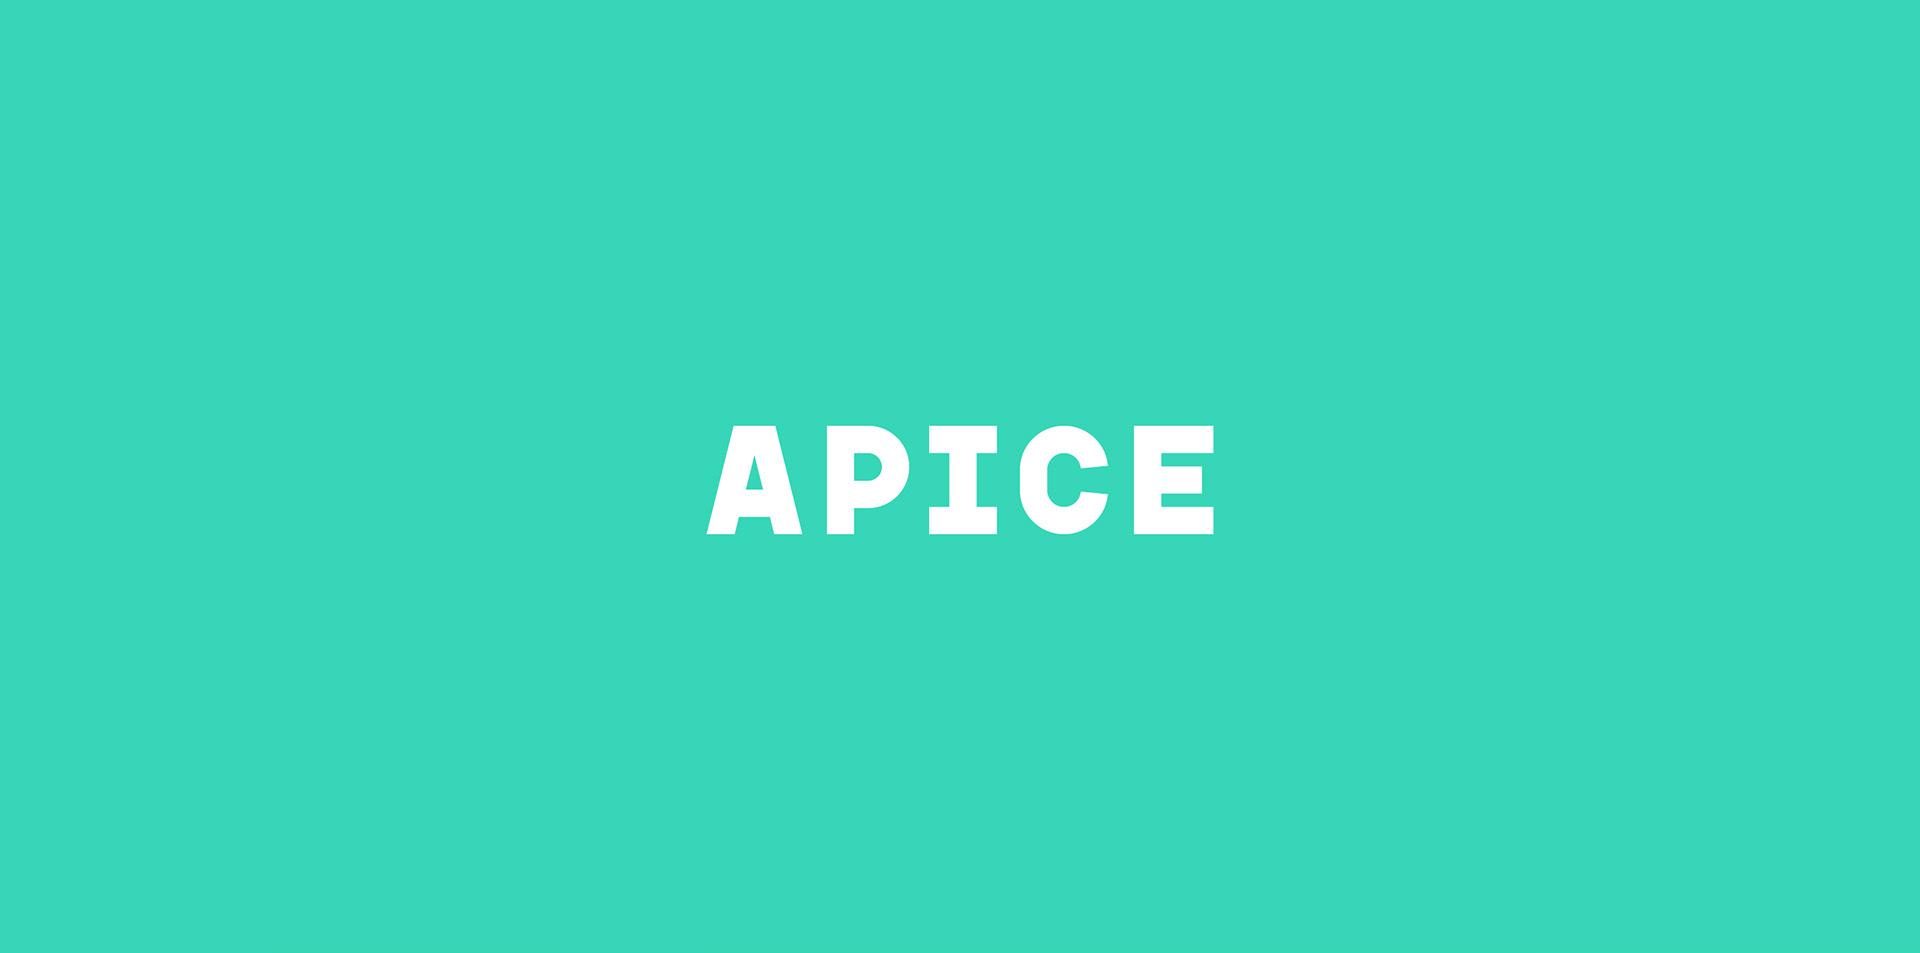 Apice Free Font Family - sans-serif